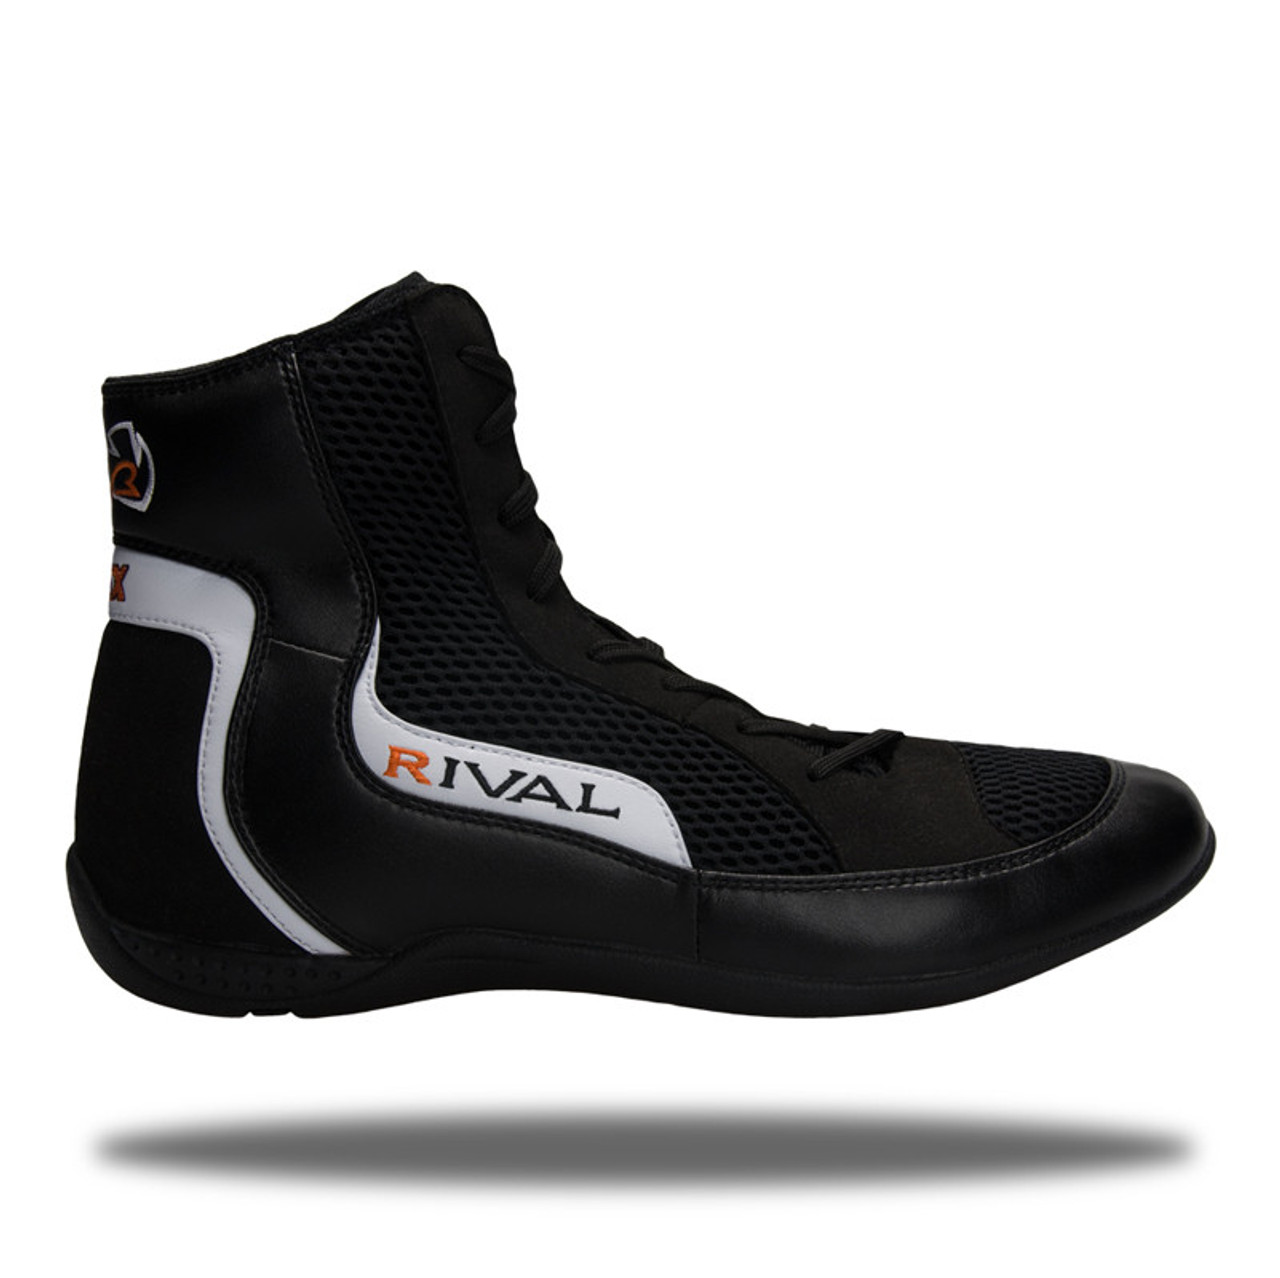 Rival Boxing RSX-LTD Boots - Battle Box UK